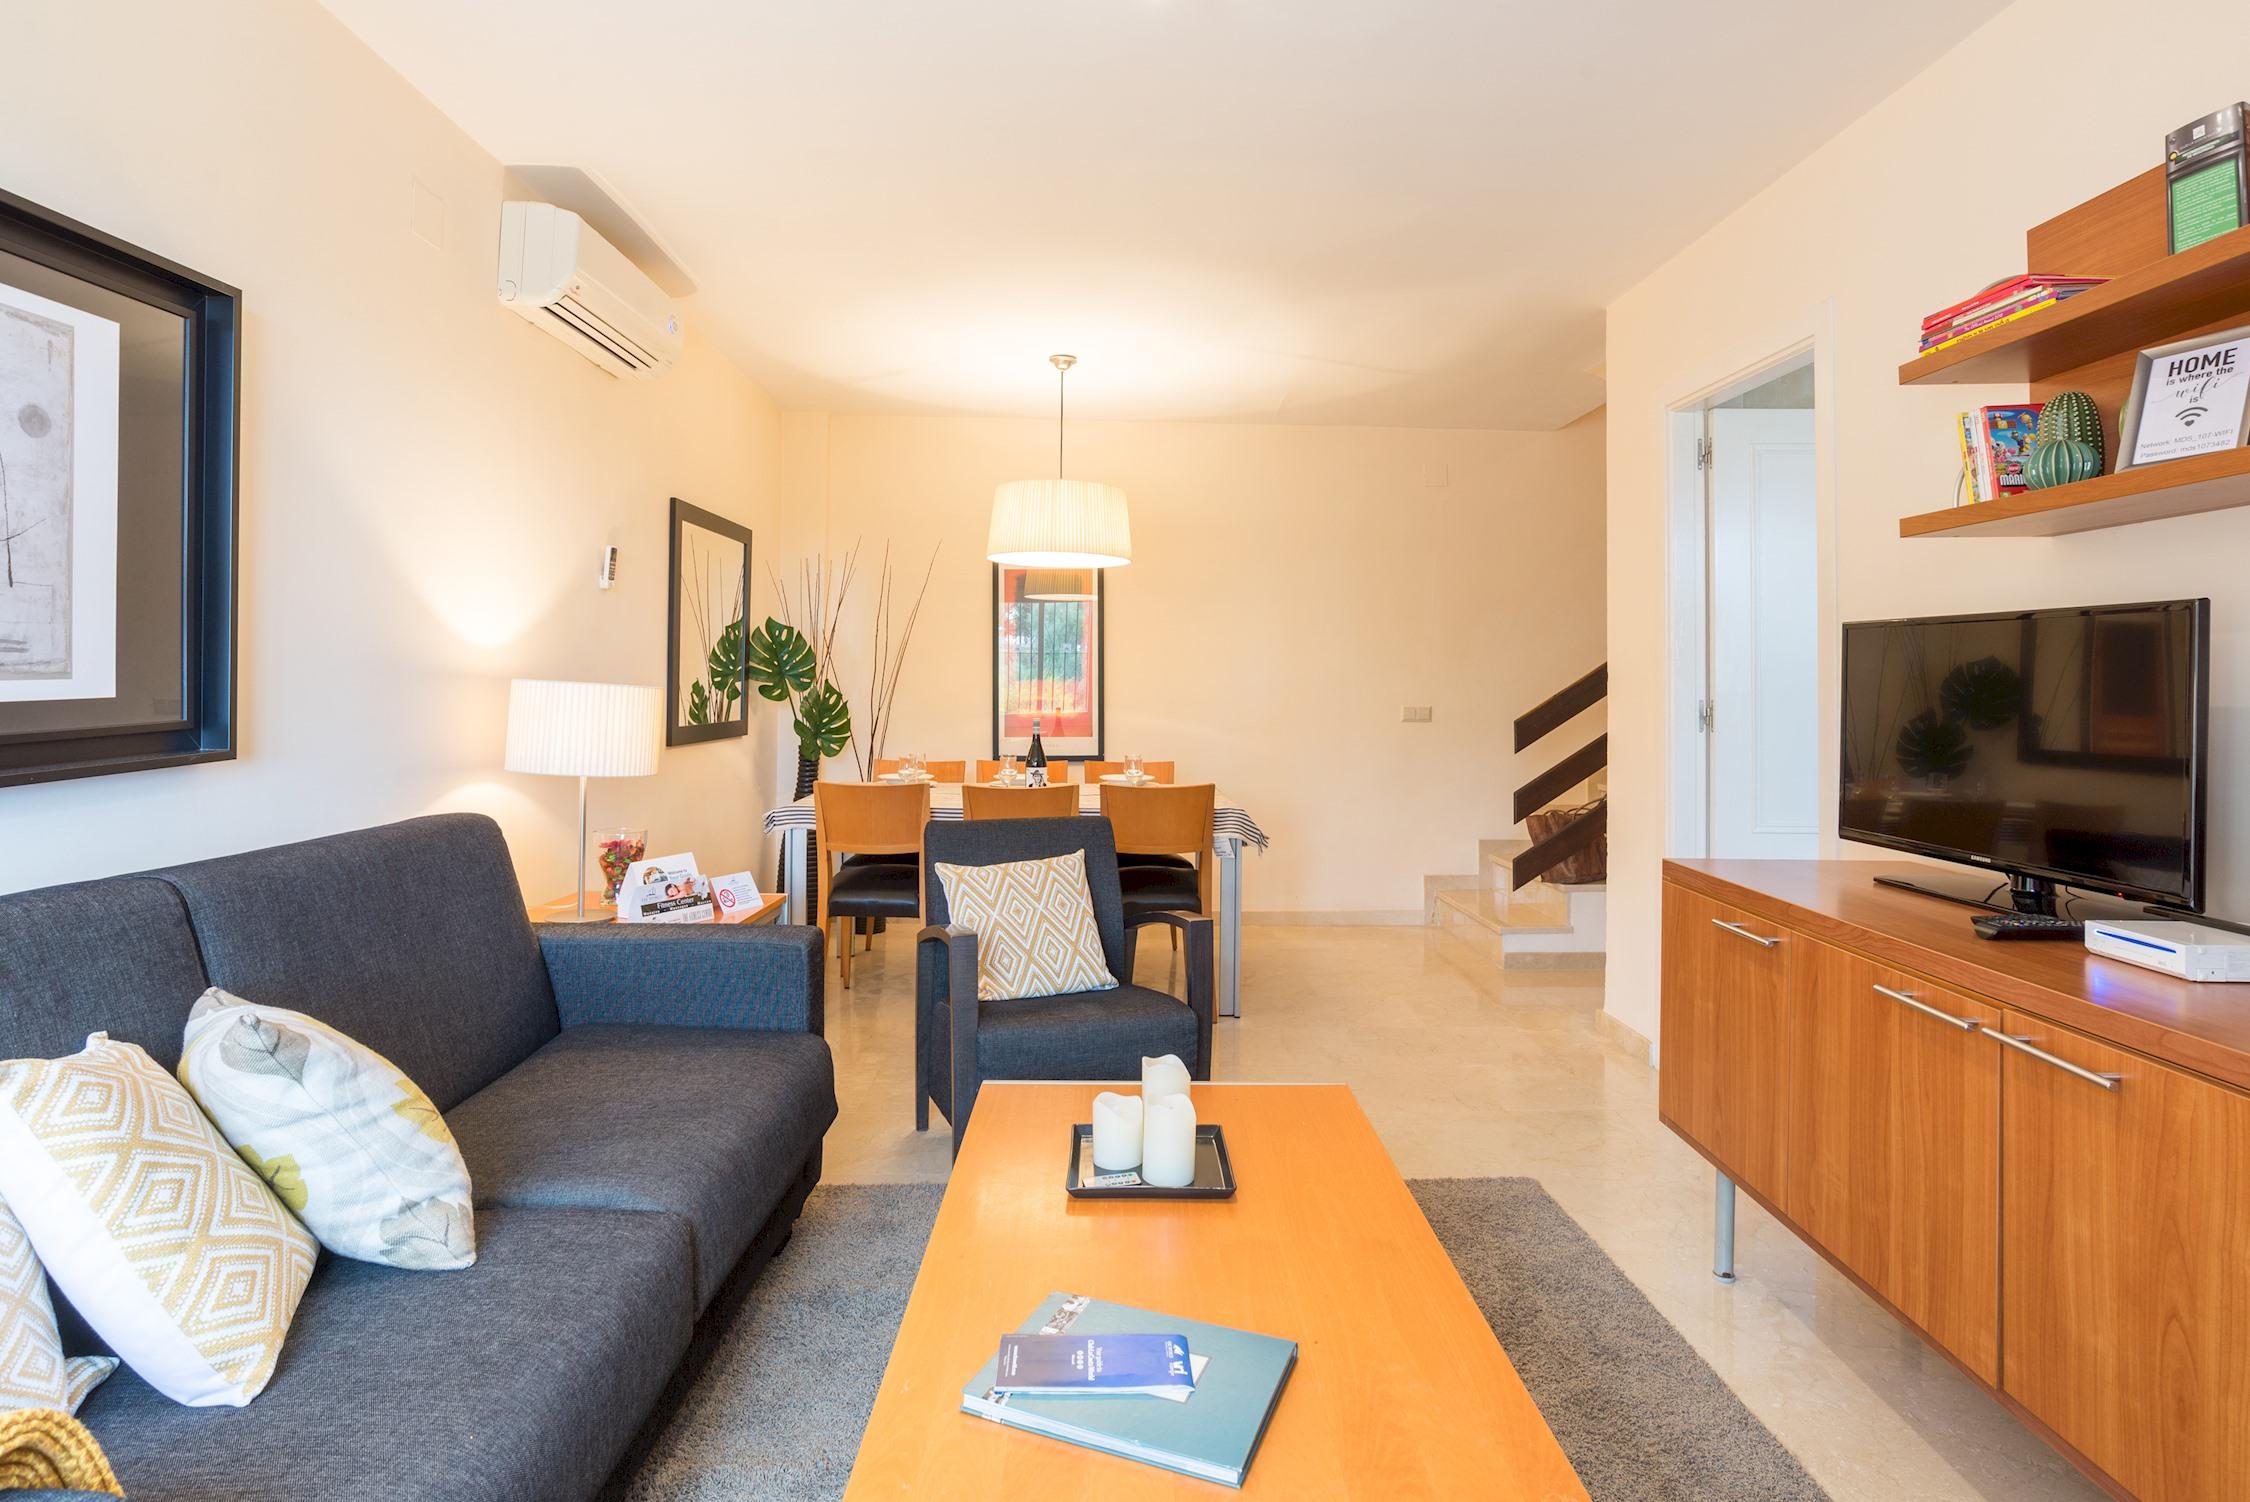 Apartment MalagaSuite Luxury   Relax photo 20518629